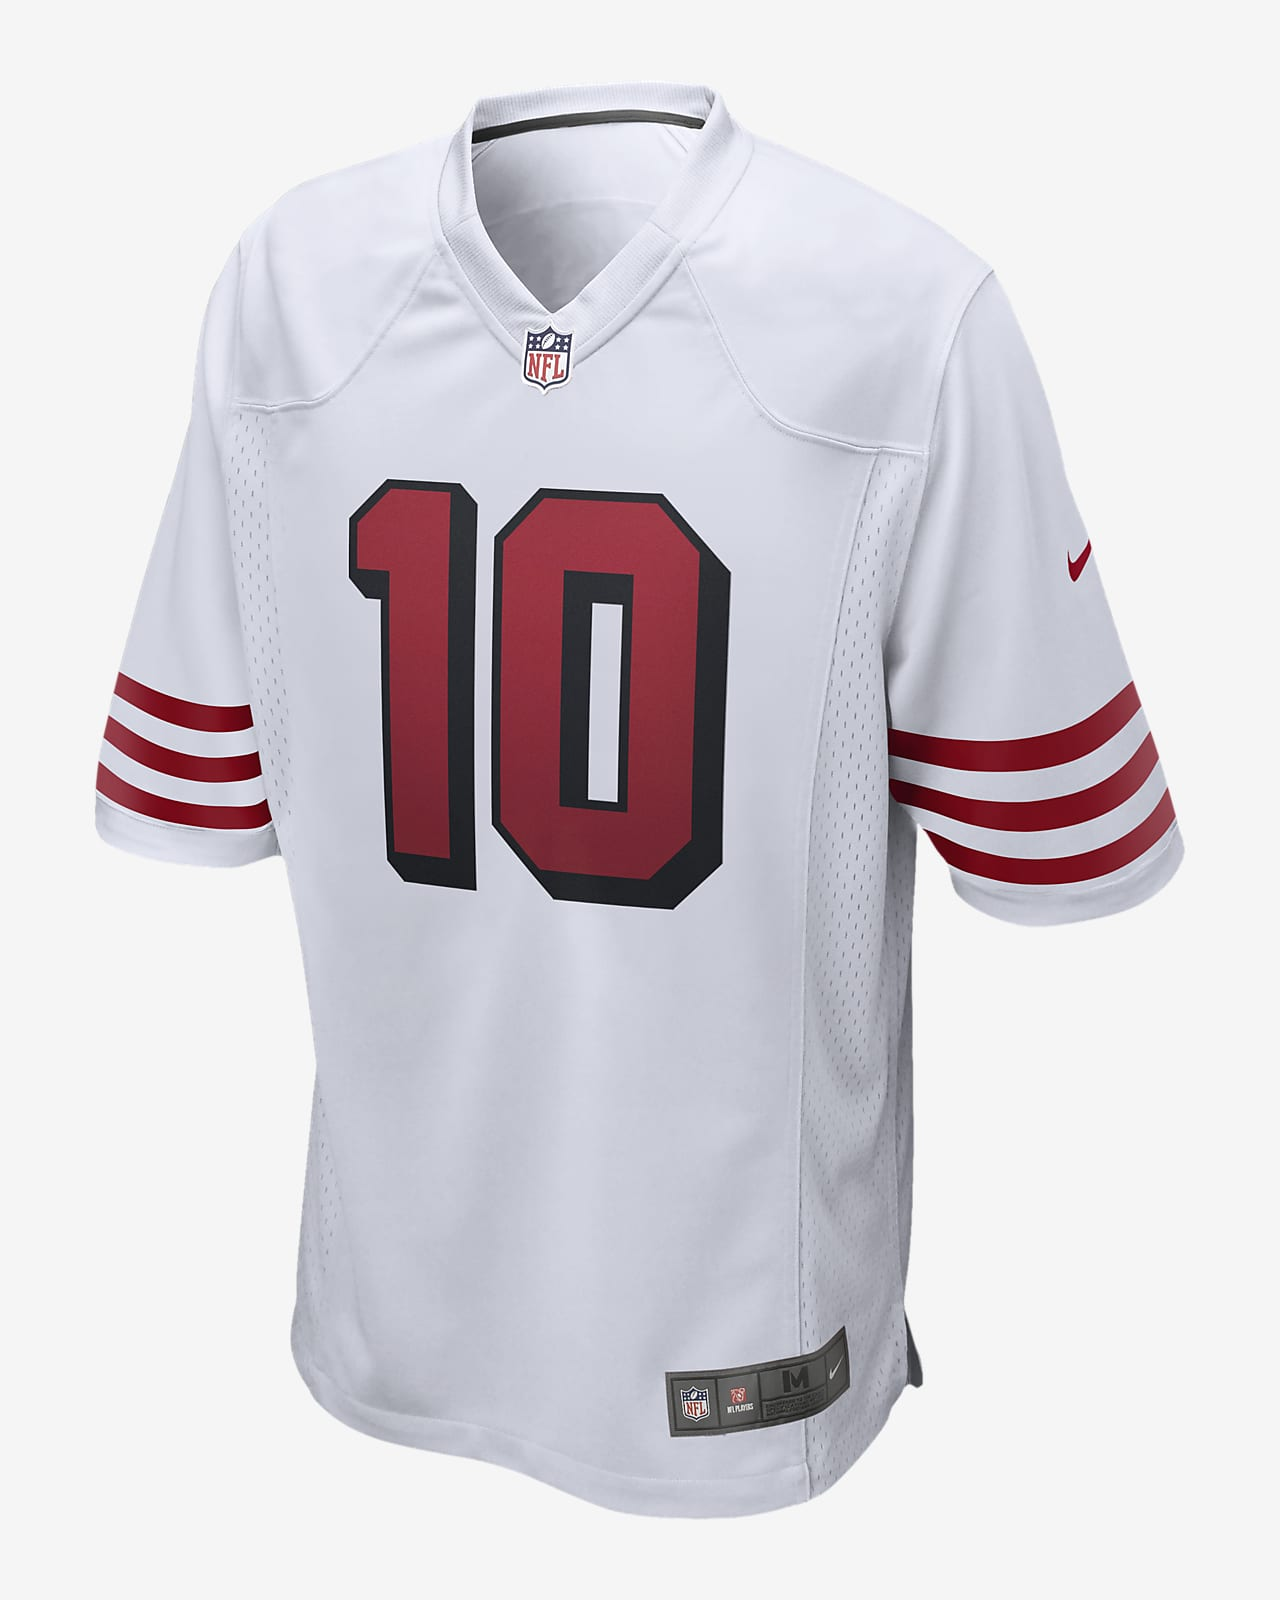 NFL San Francisco 49ers (Jimmy Garoppolo) Men's Game Football Jersey